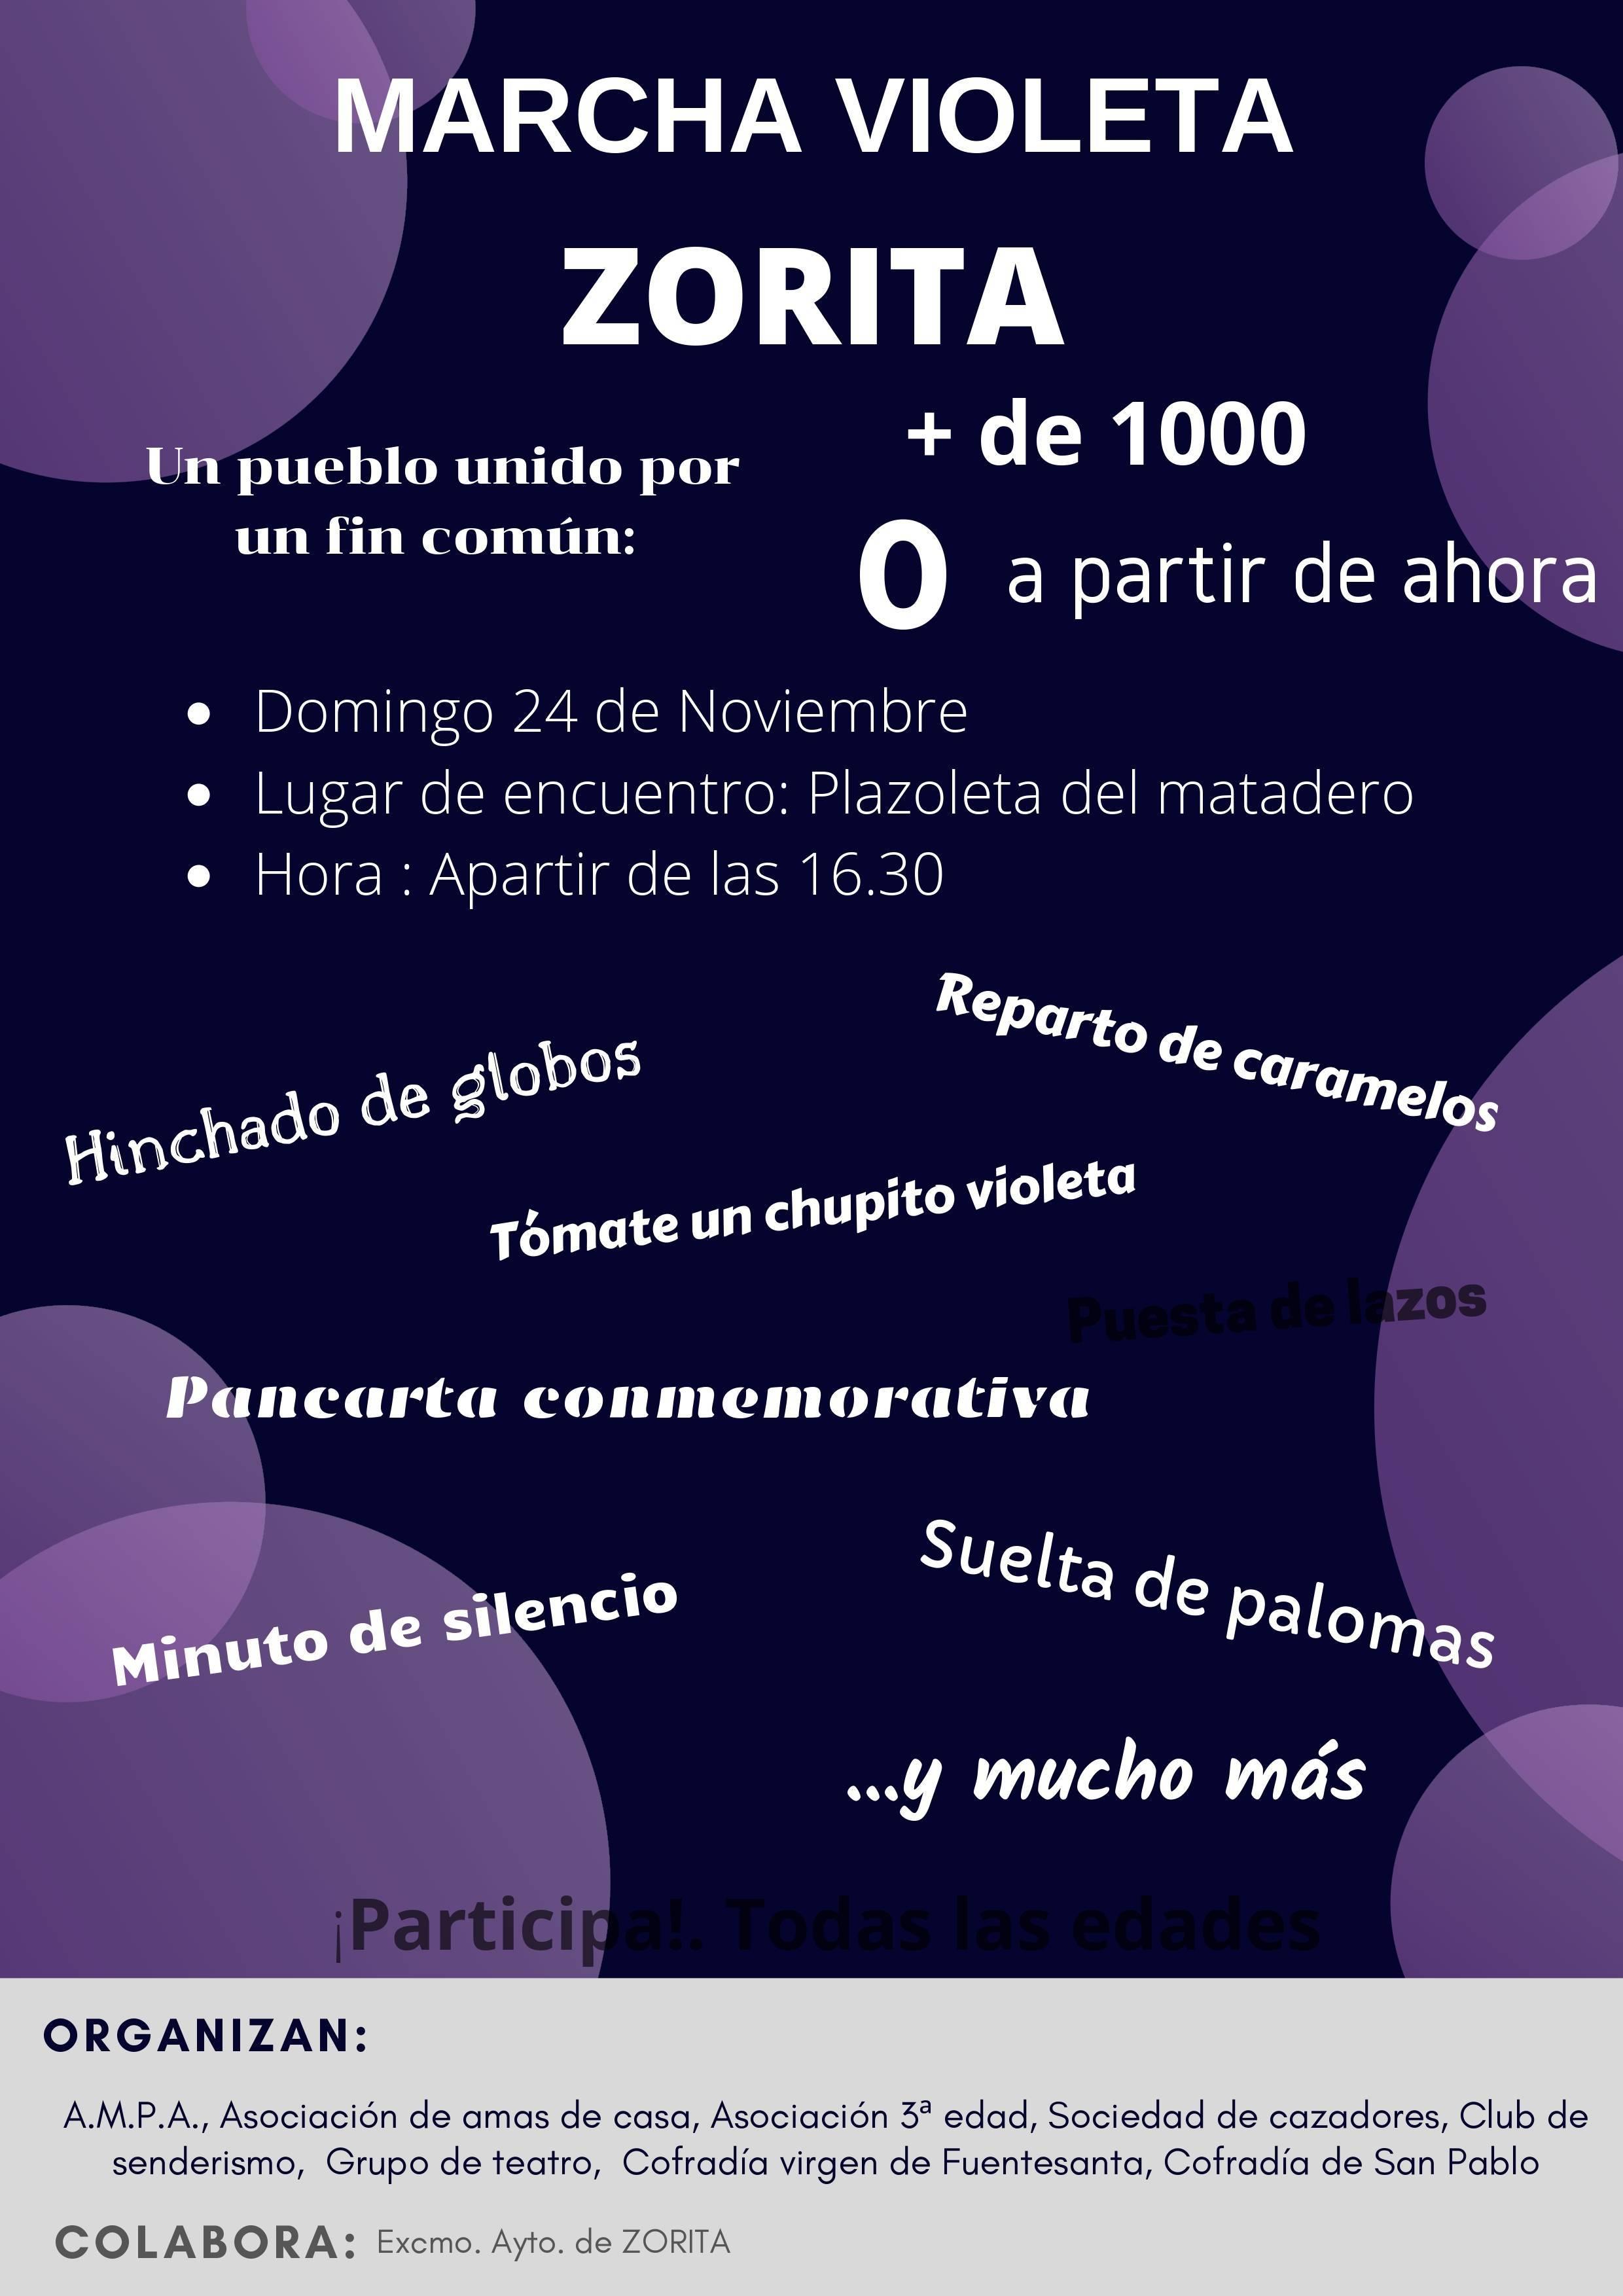 Marcha violeta 2019 - Zorita (Cáceres)